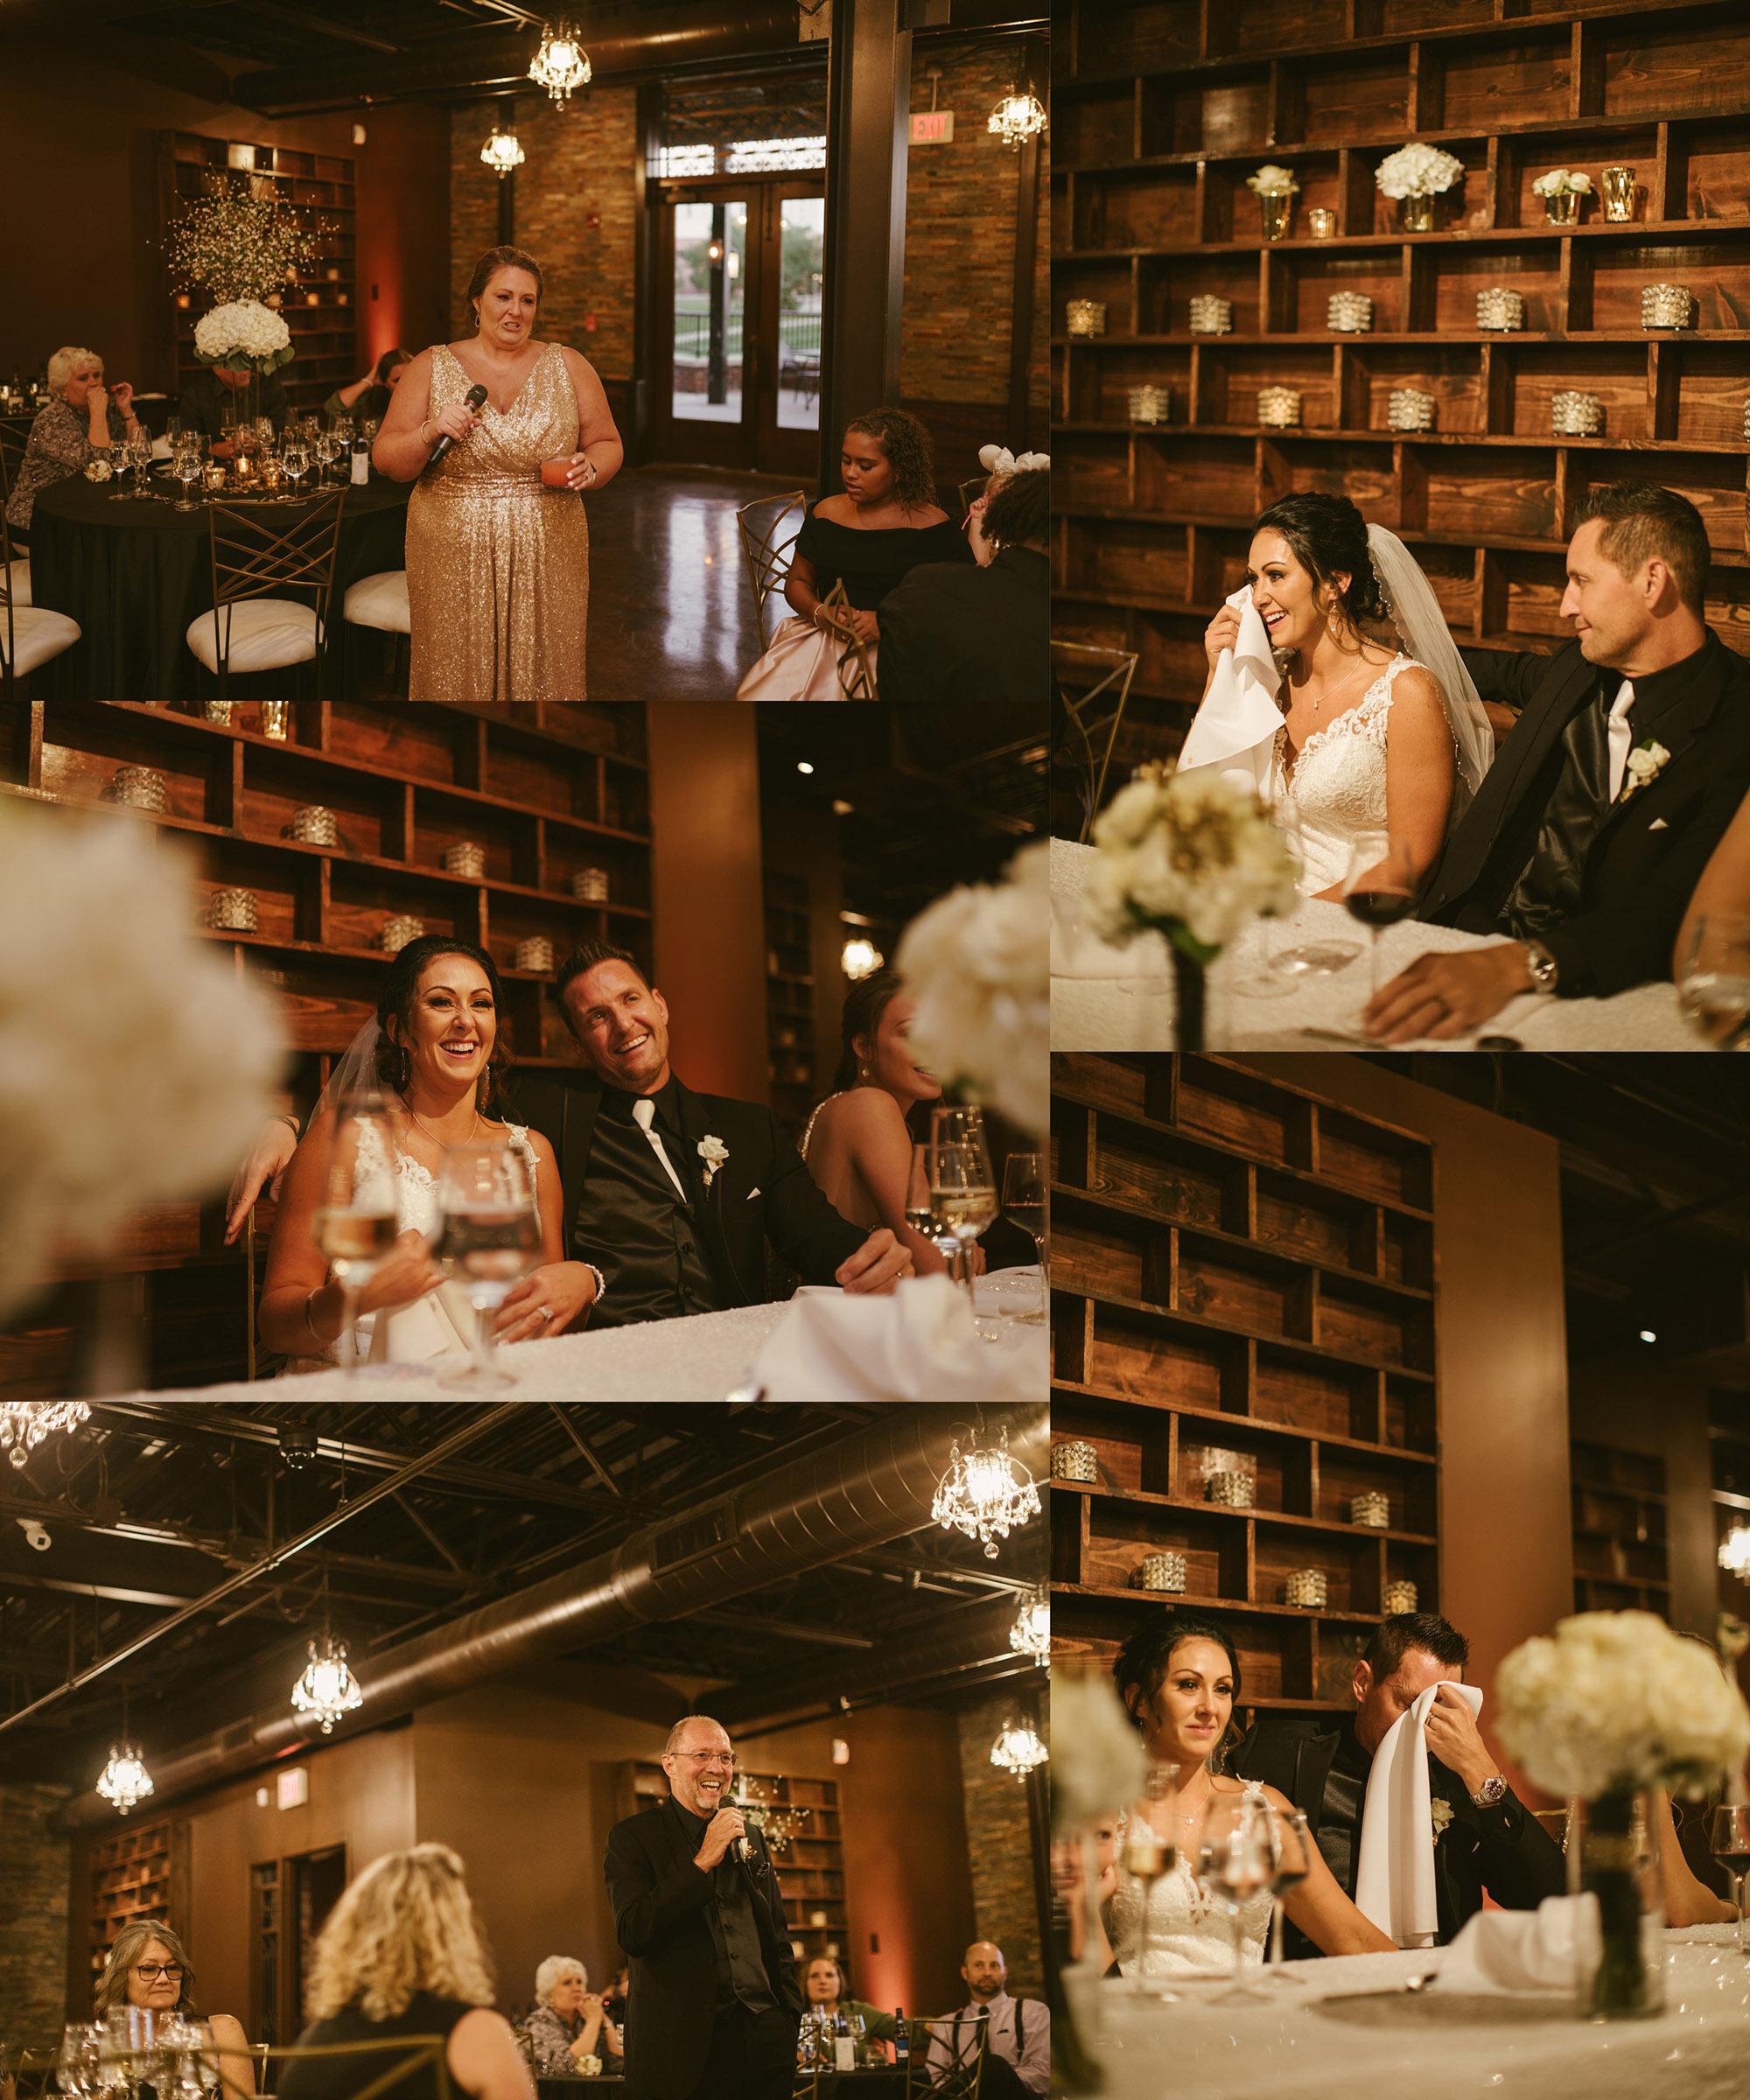 031 aimee ryan wedding canal 337 web.jpg